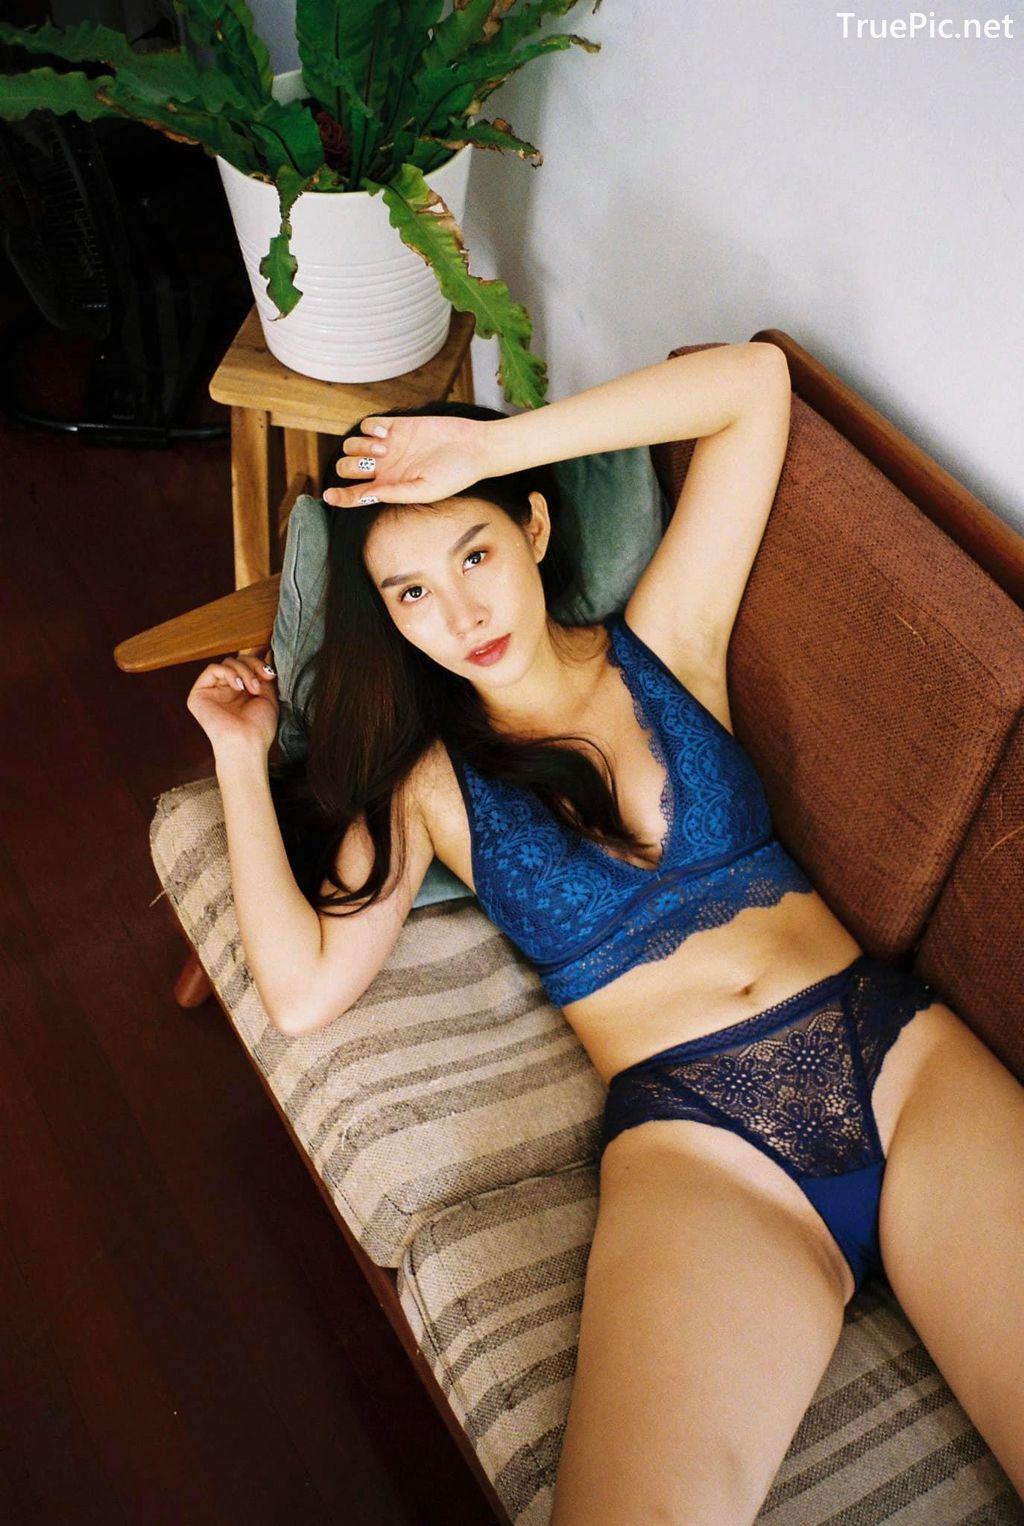 Image-Thailand-Model-Ssomch-Tanass-Blue-Lingerie-TruePic.net-TruePic.net- Picture-15